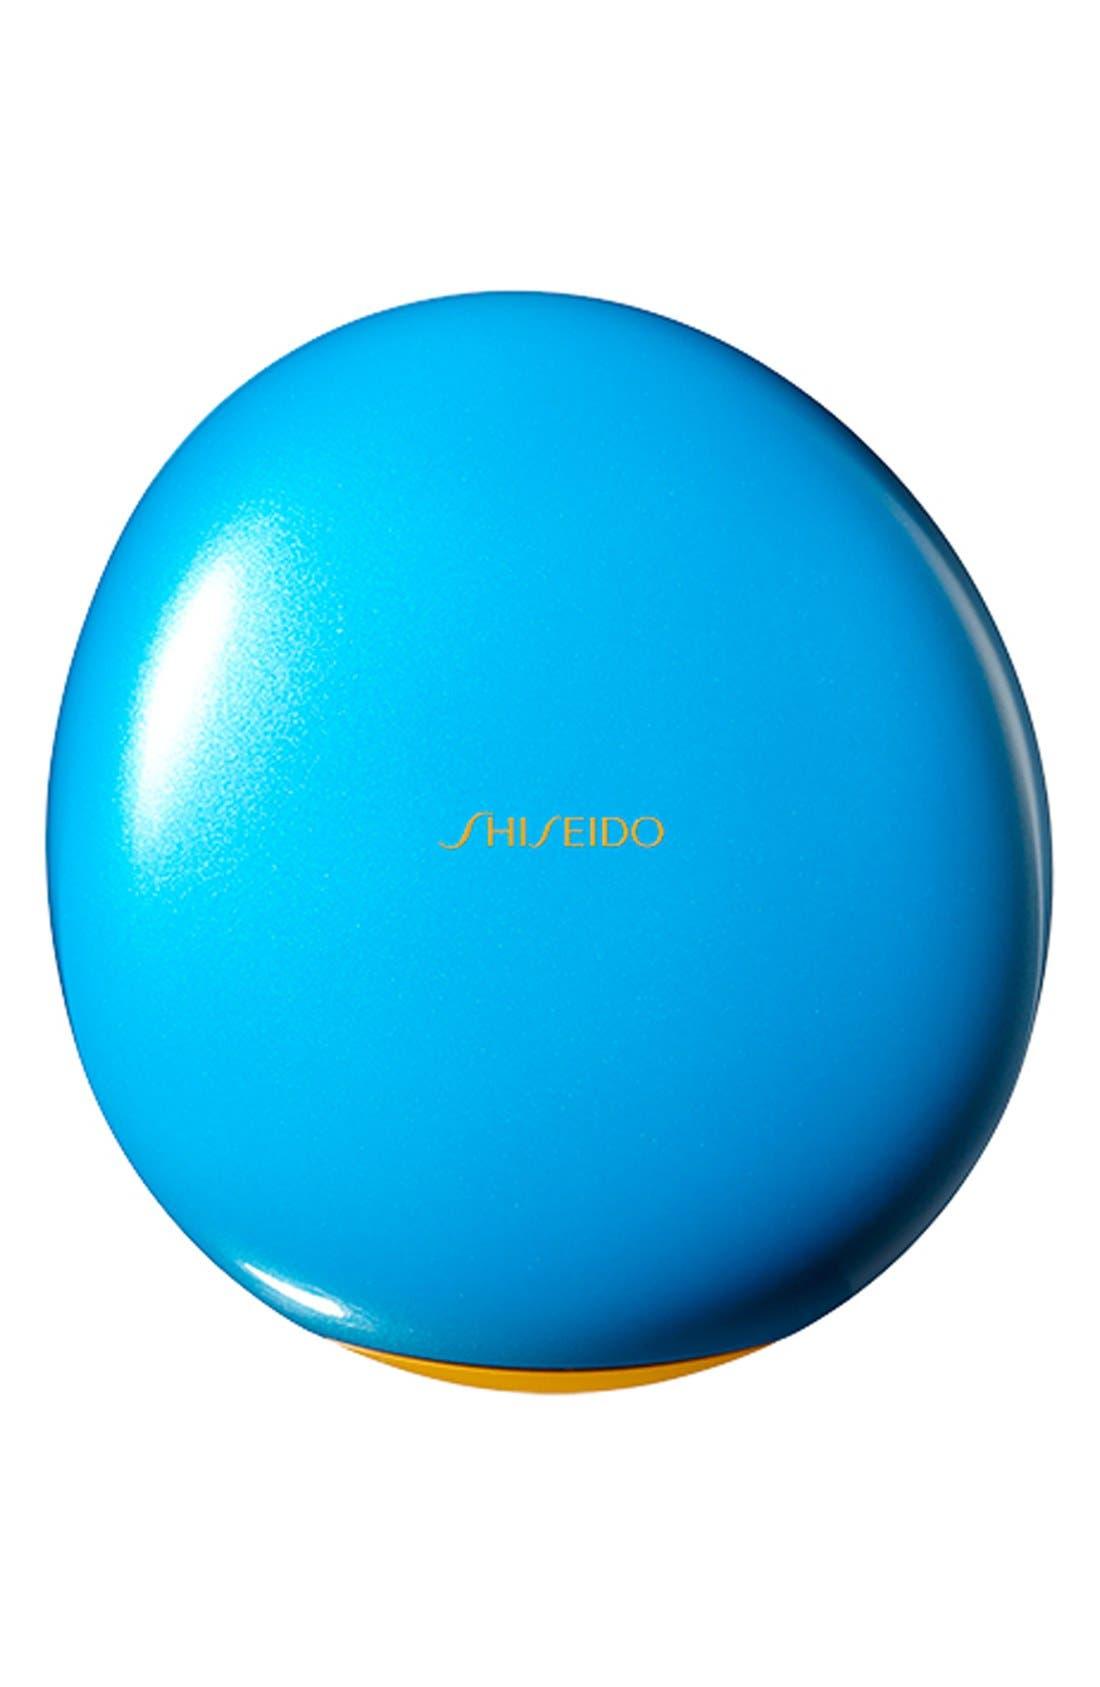 Shiseido UV Protective Compact Foundation Compact Case